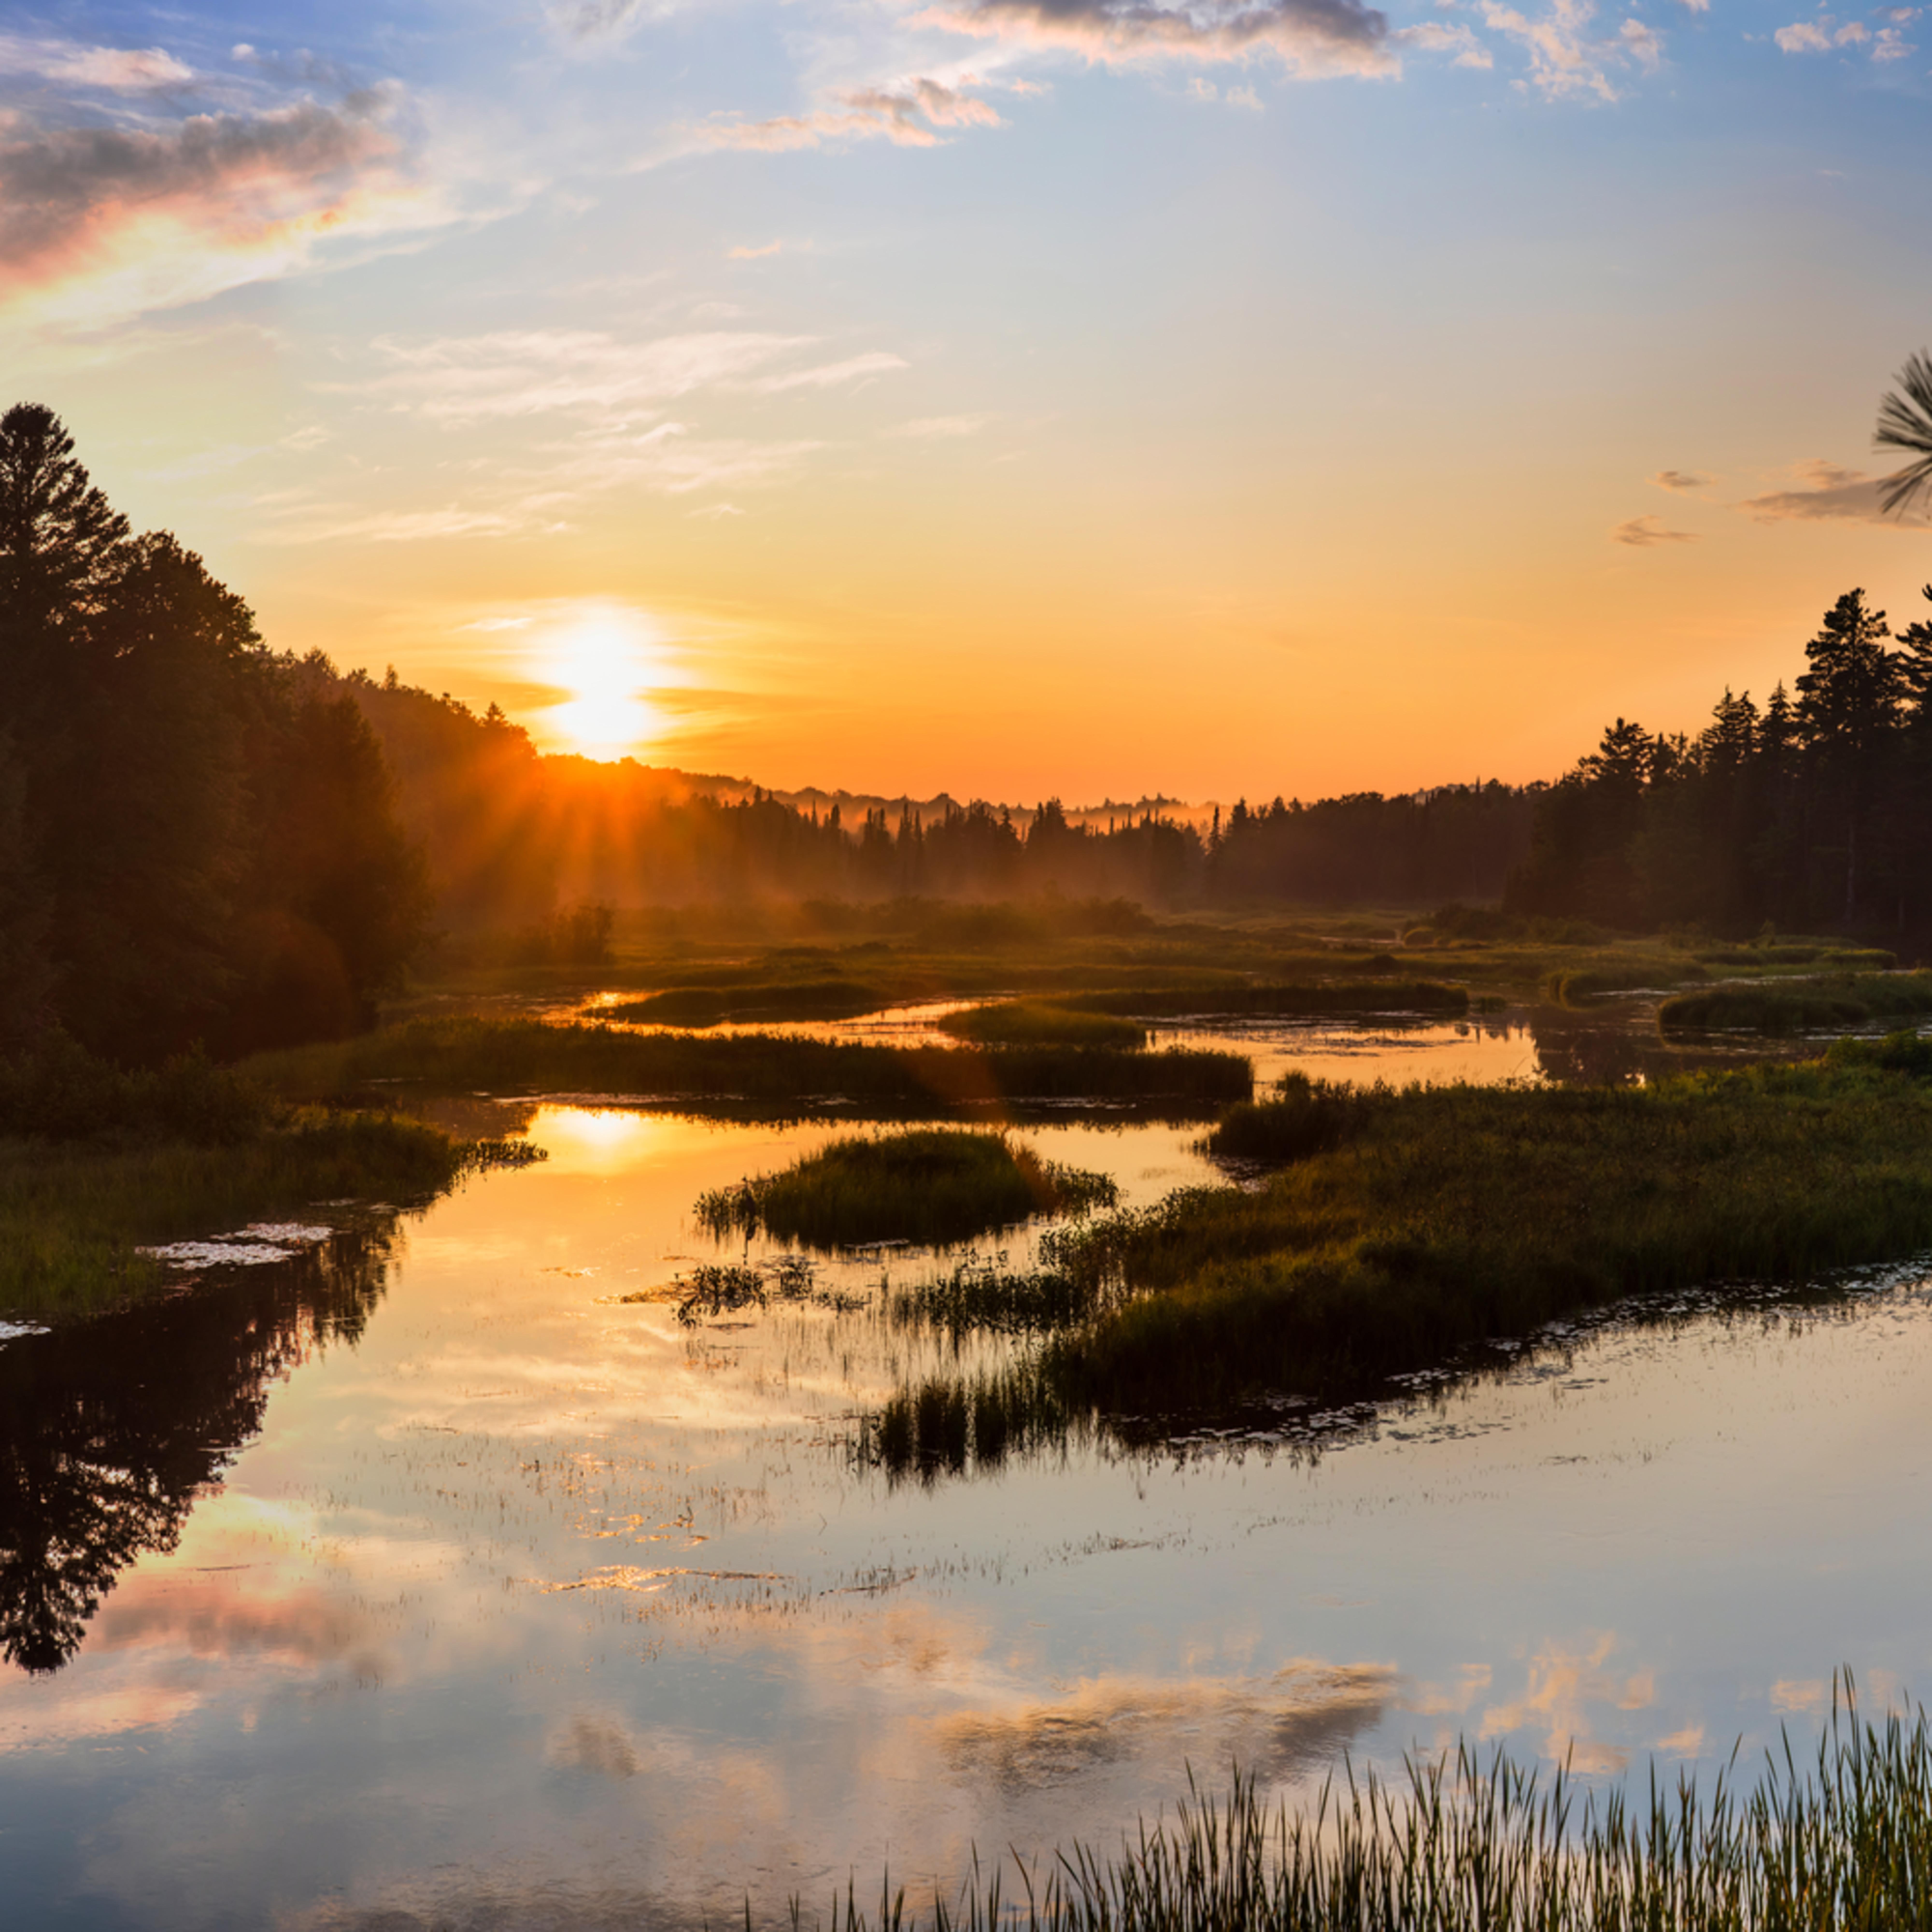 Moose river 2019 lrg xoz1qg